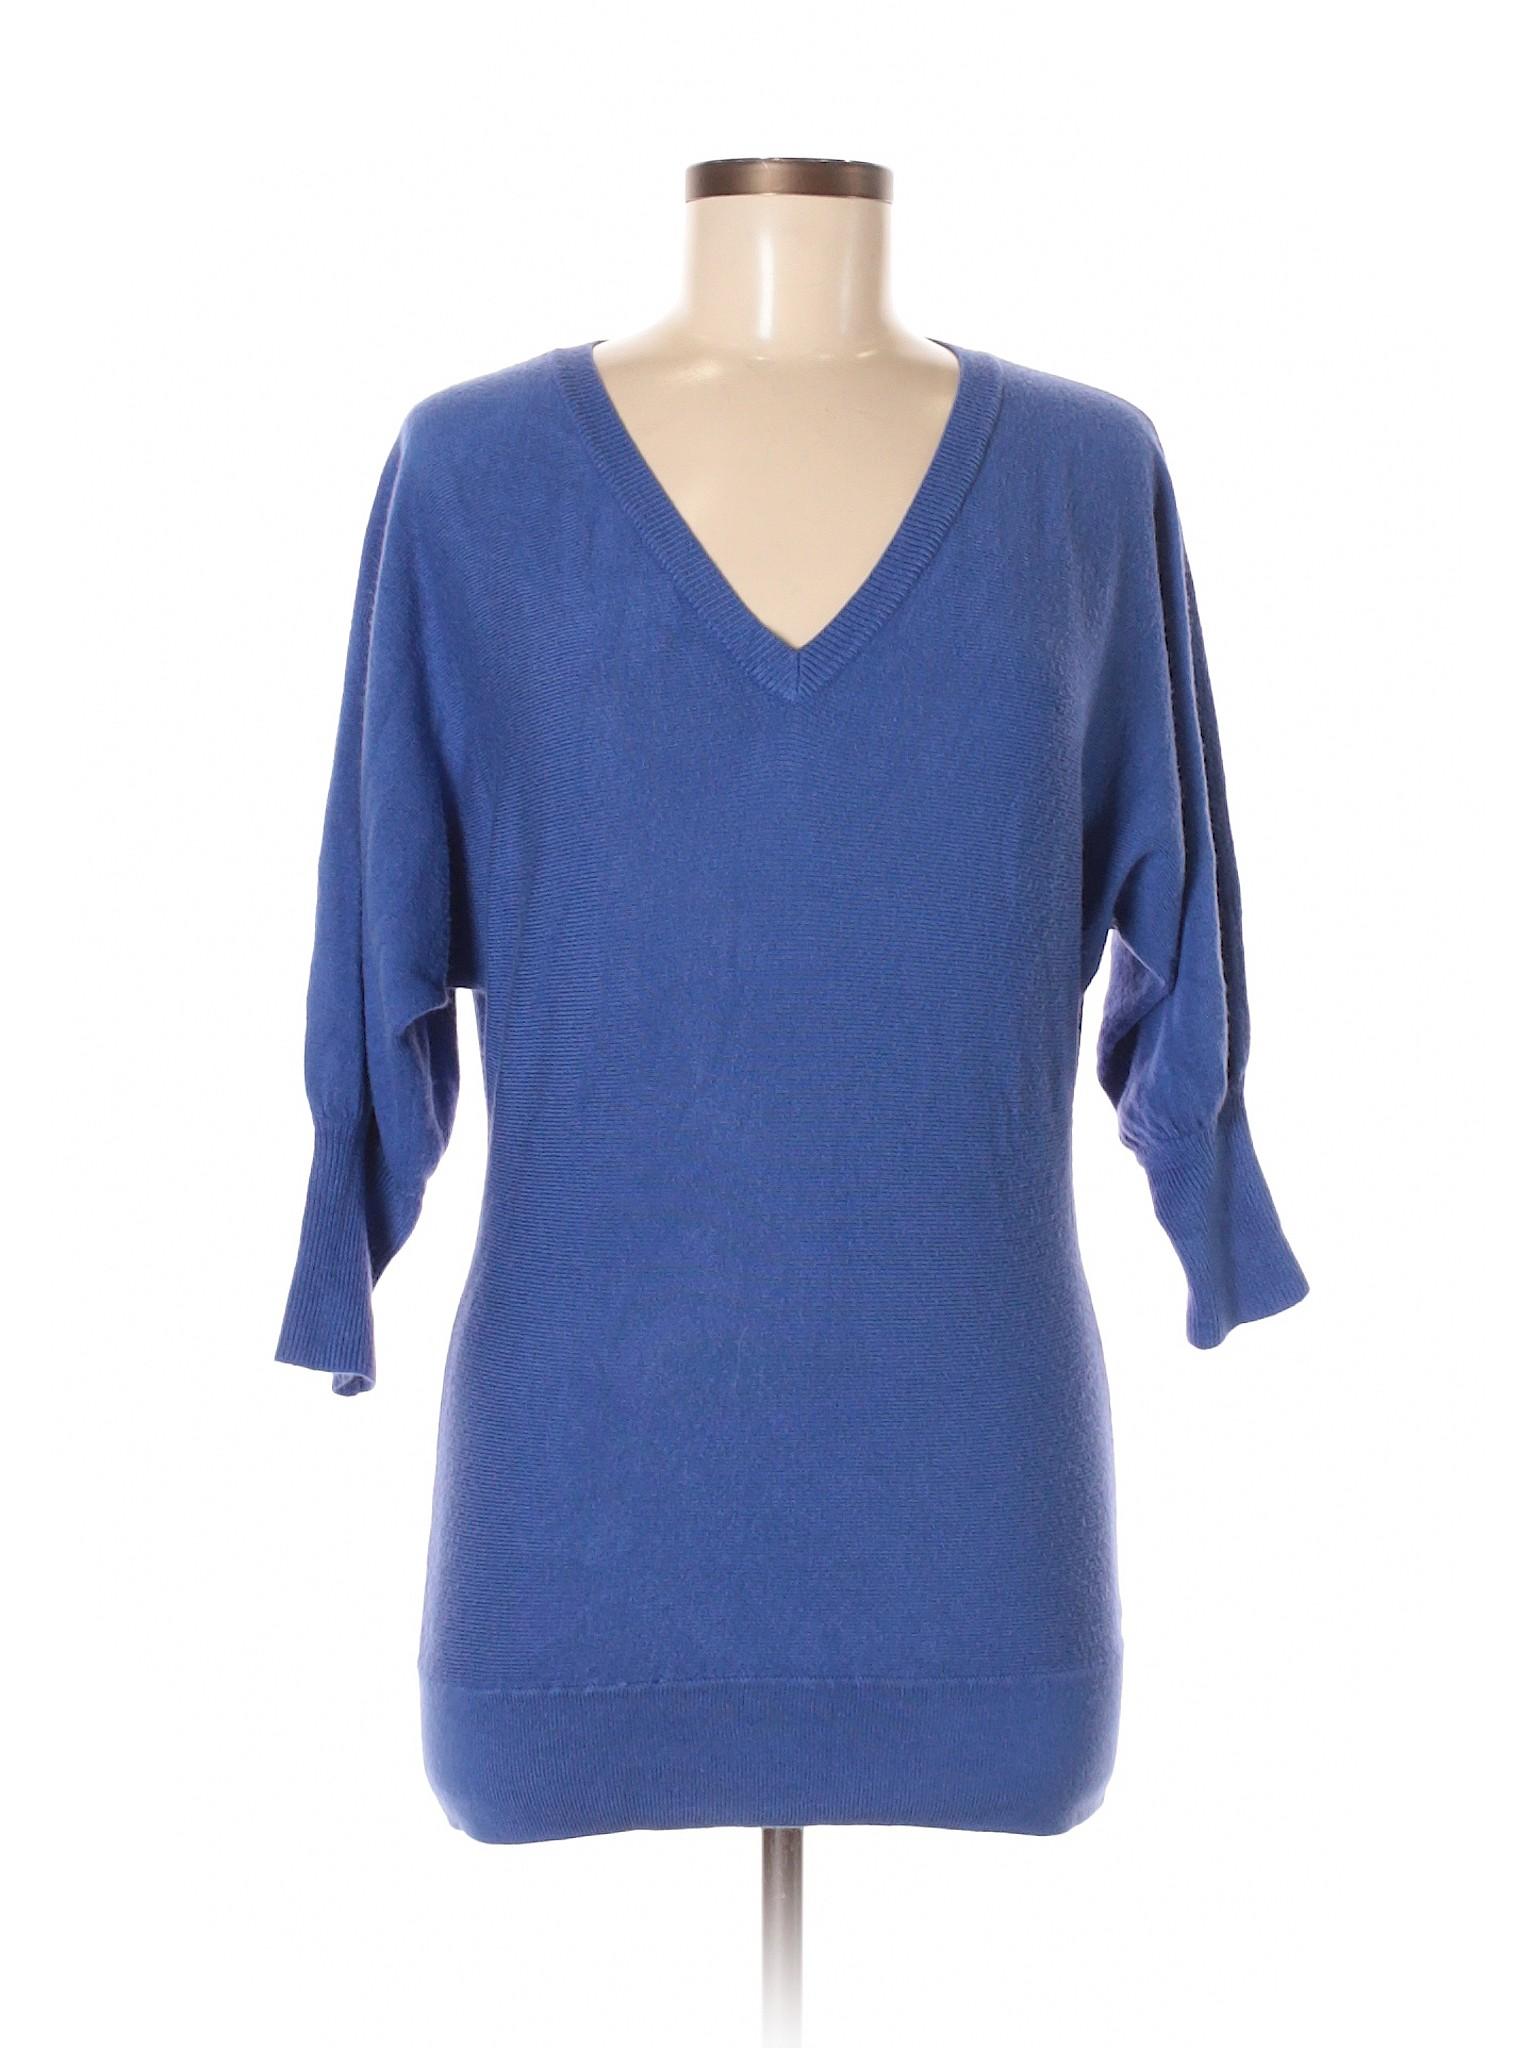 York amp; Pullover New Boutique Sweater Company qZxw6RE5